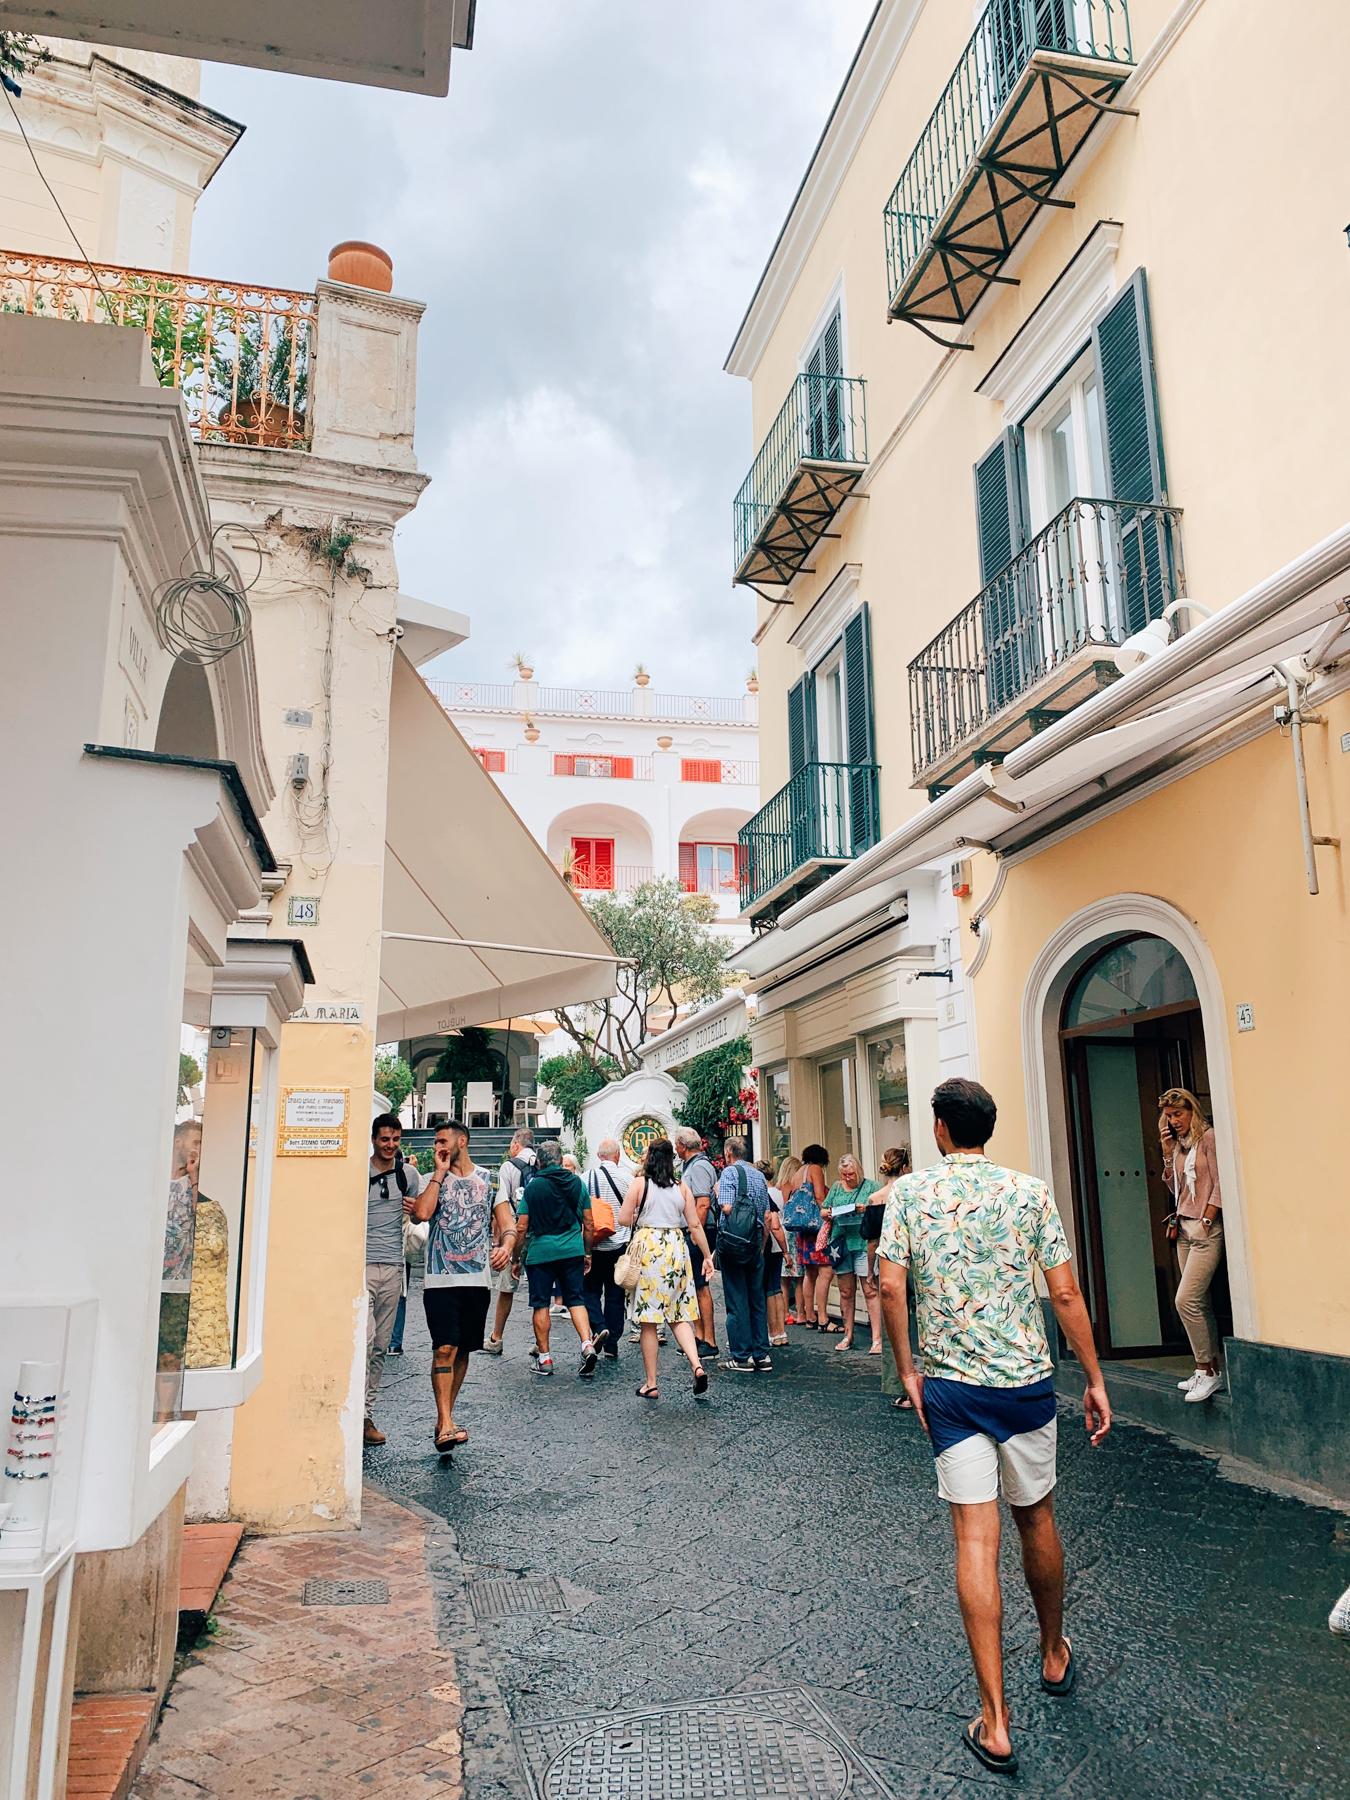 Nate walking around Capri town.